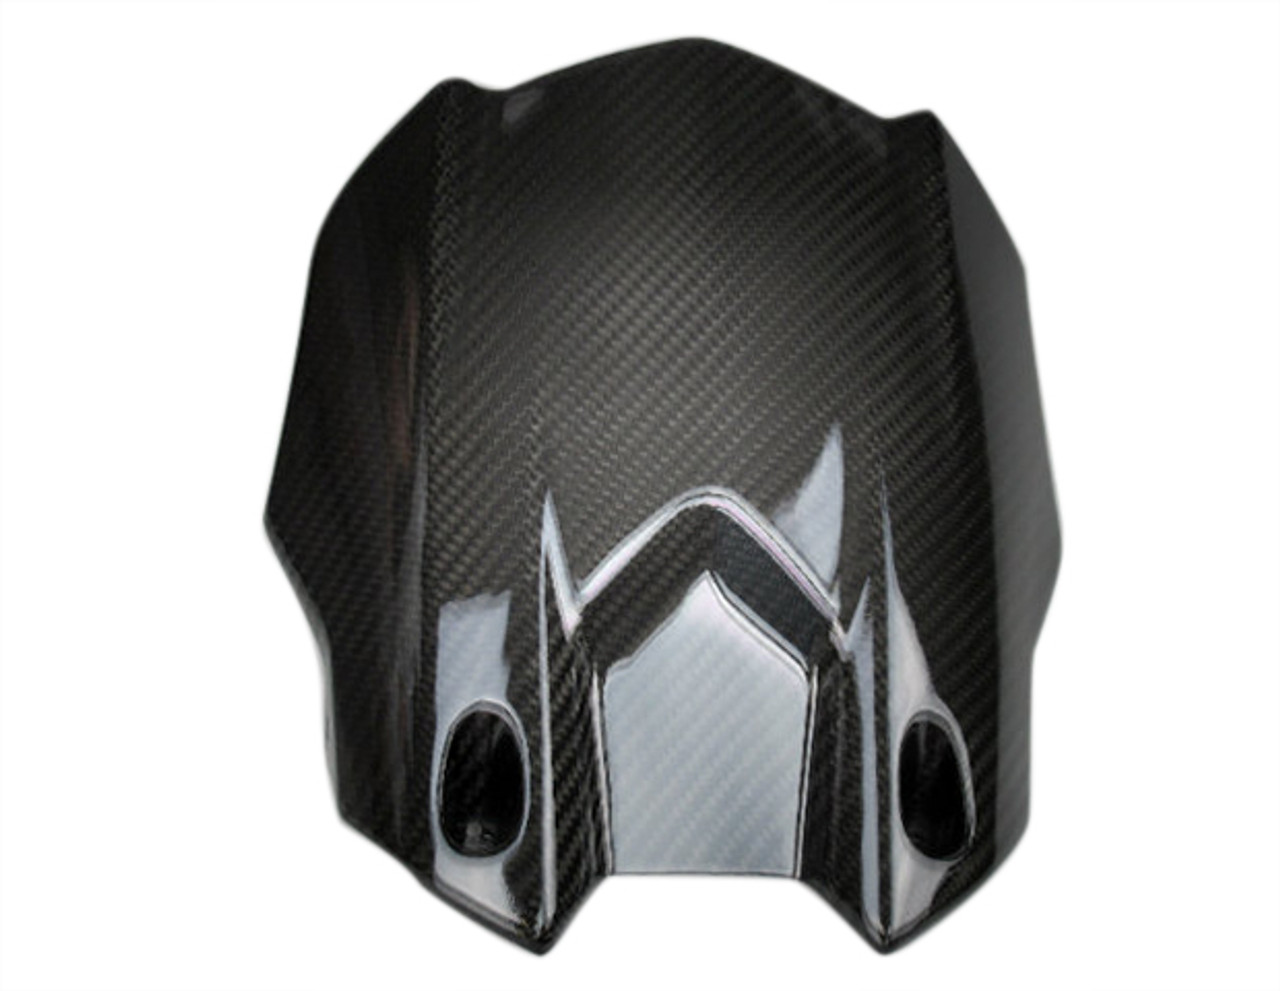 Rear Hugger in Glossy Twill Weave Carbon Fiber for Yamaha R1 2015+, FZ-10/MT-10 2017+